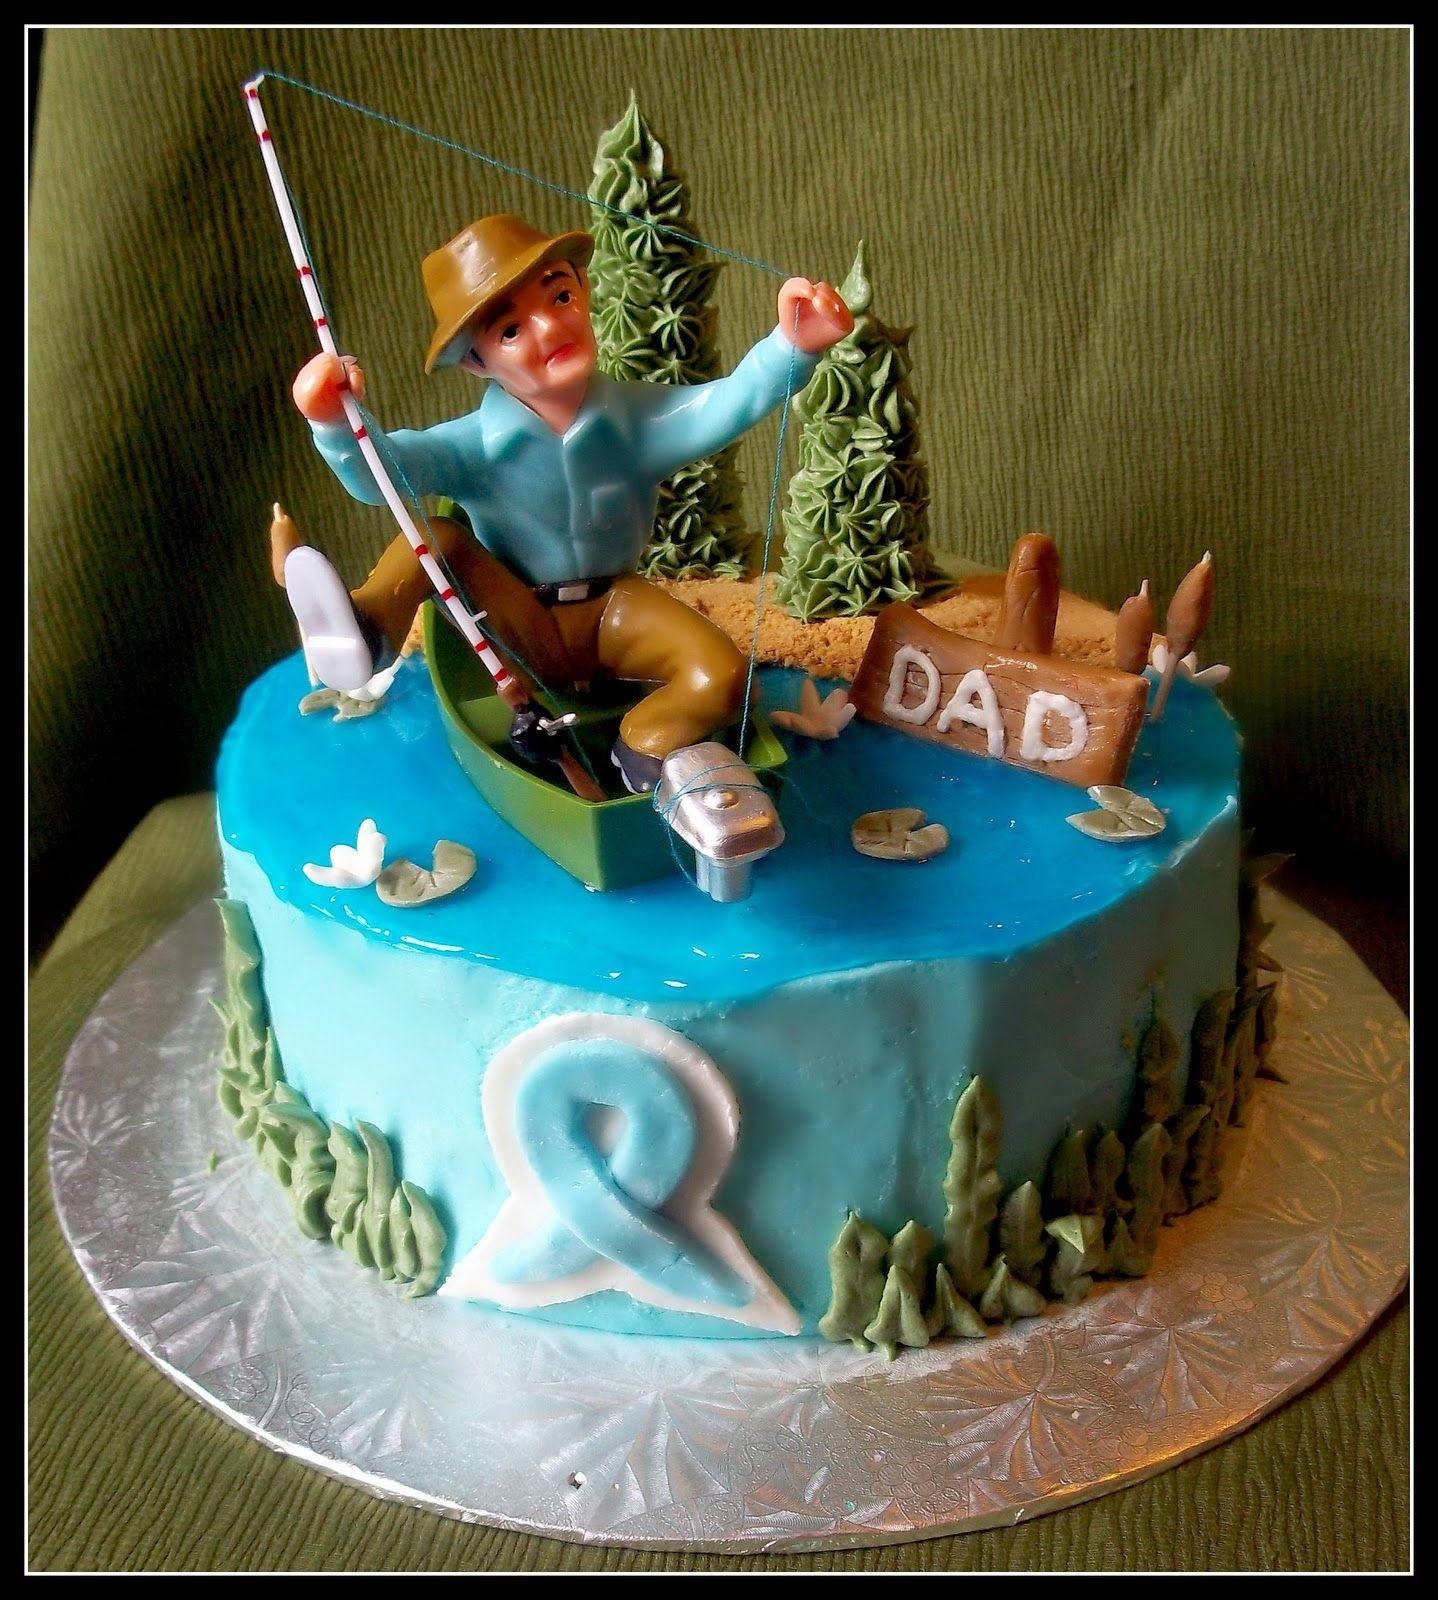 Related Image Cakes Fish Cake Birthday Birthday Cakes